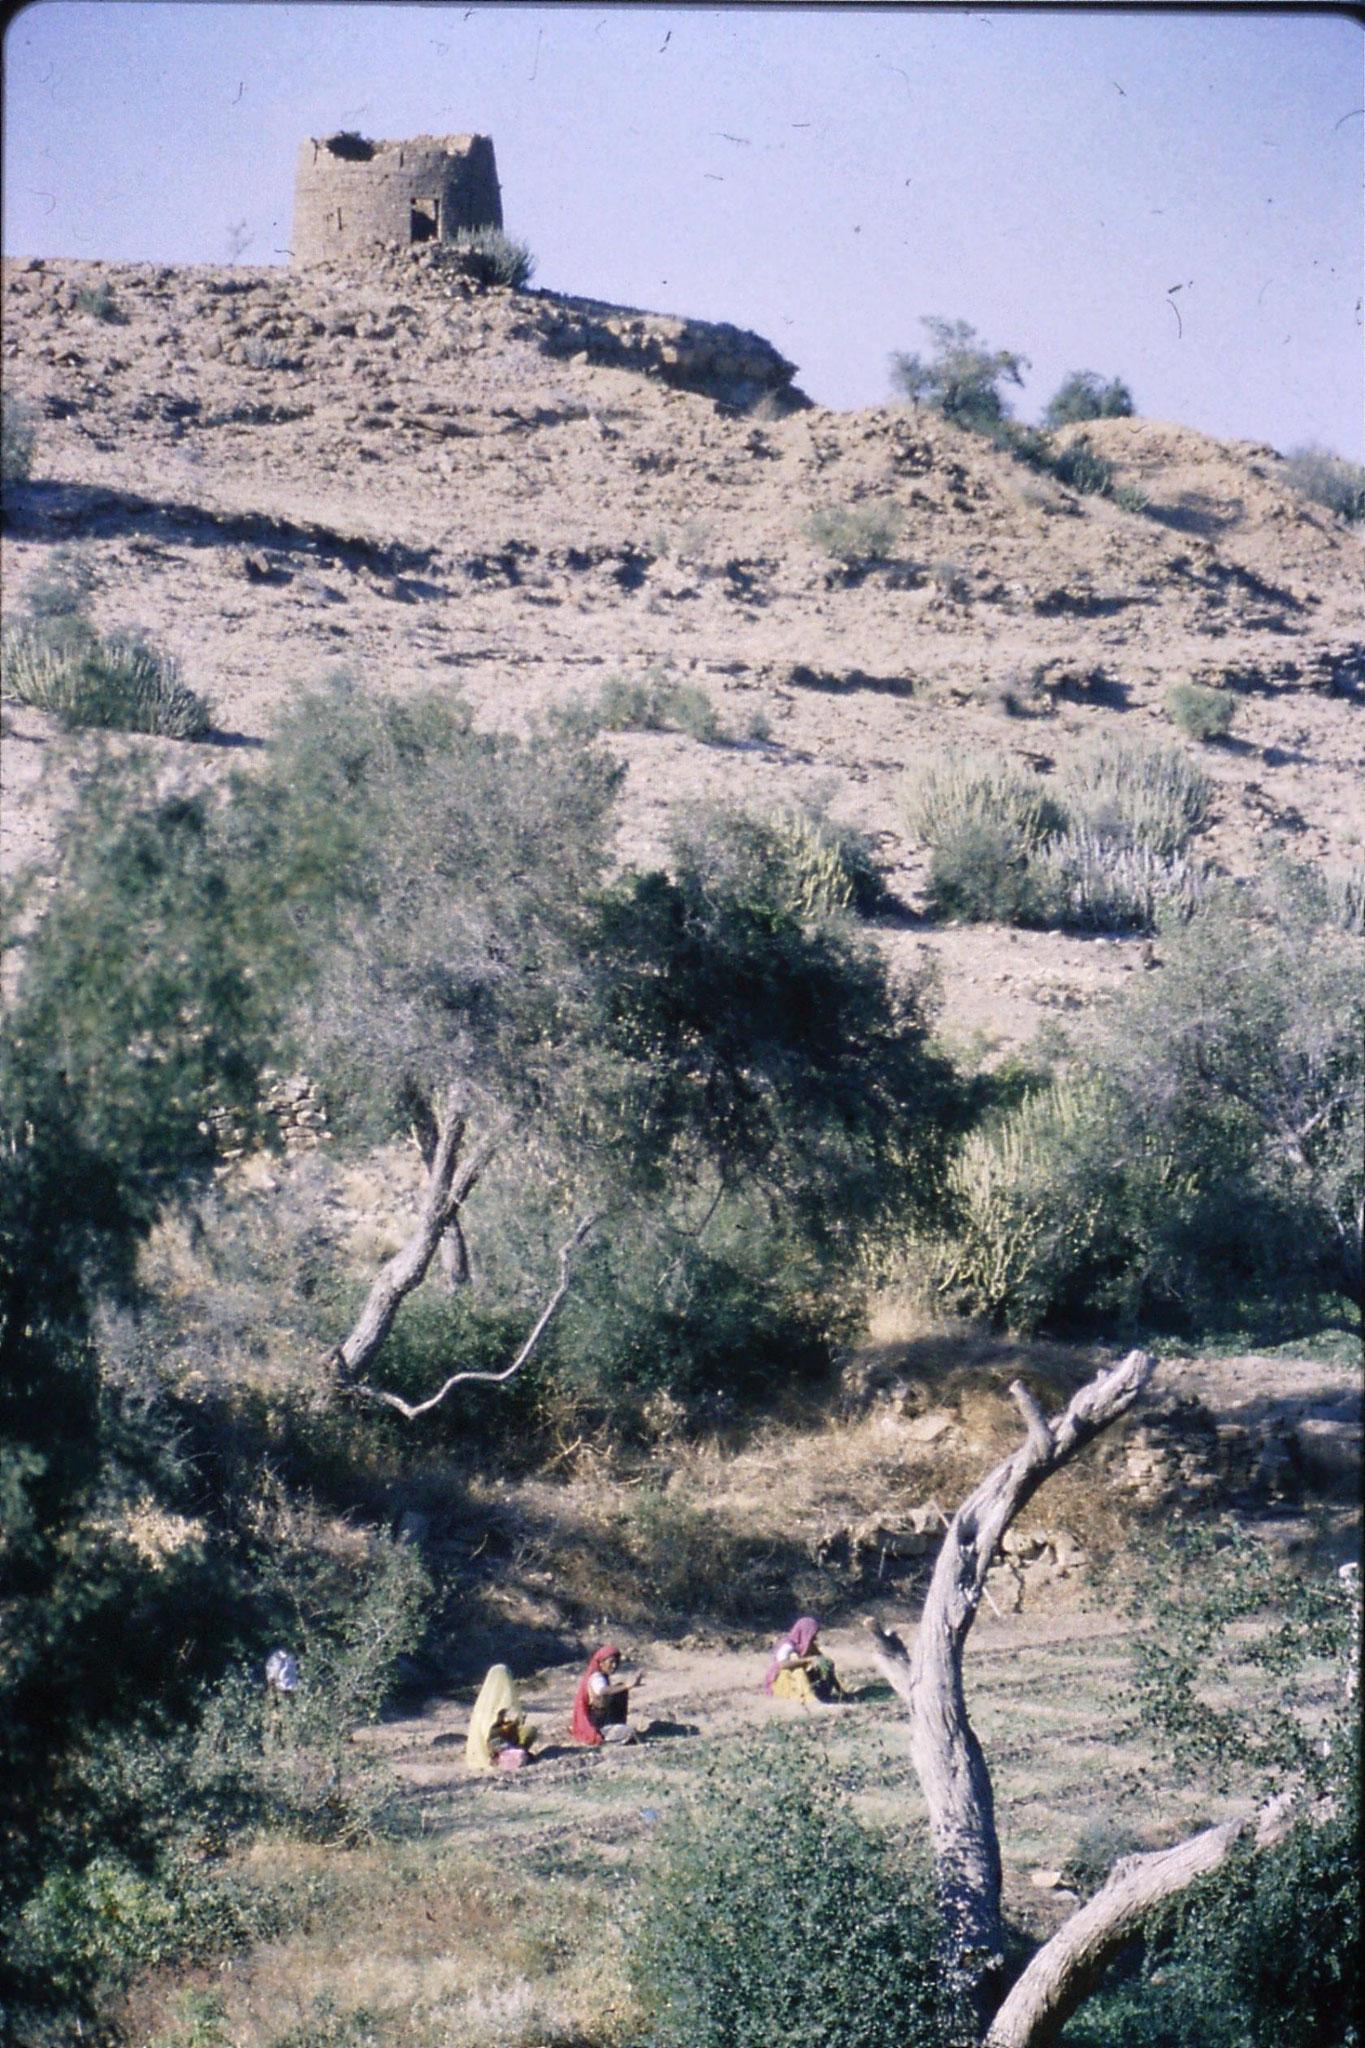 4/12/1989: 8: north of Jaisalmer